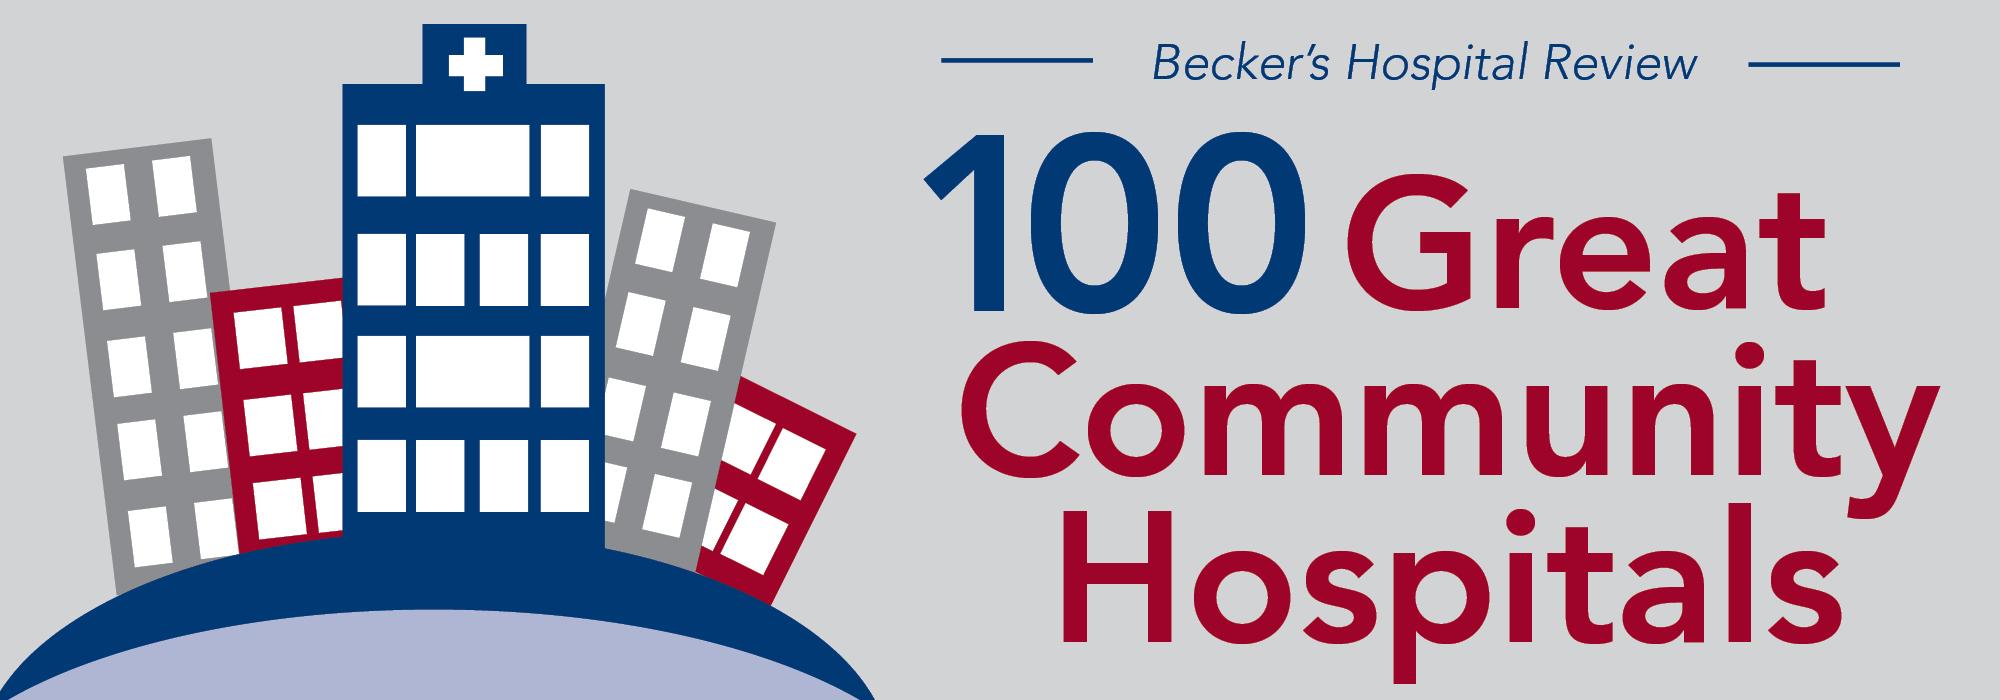 Great Community Hospitals 2017 Logo